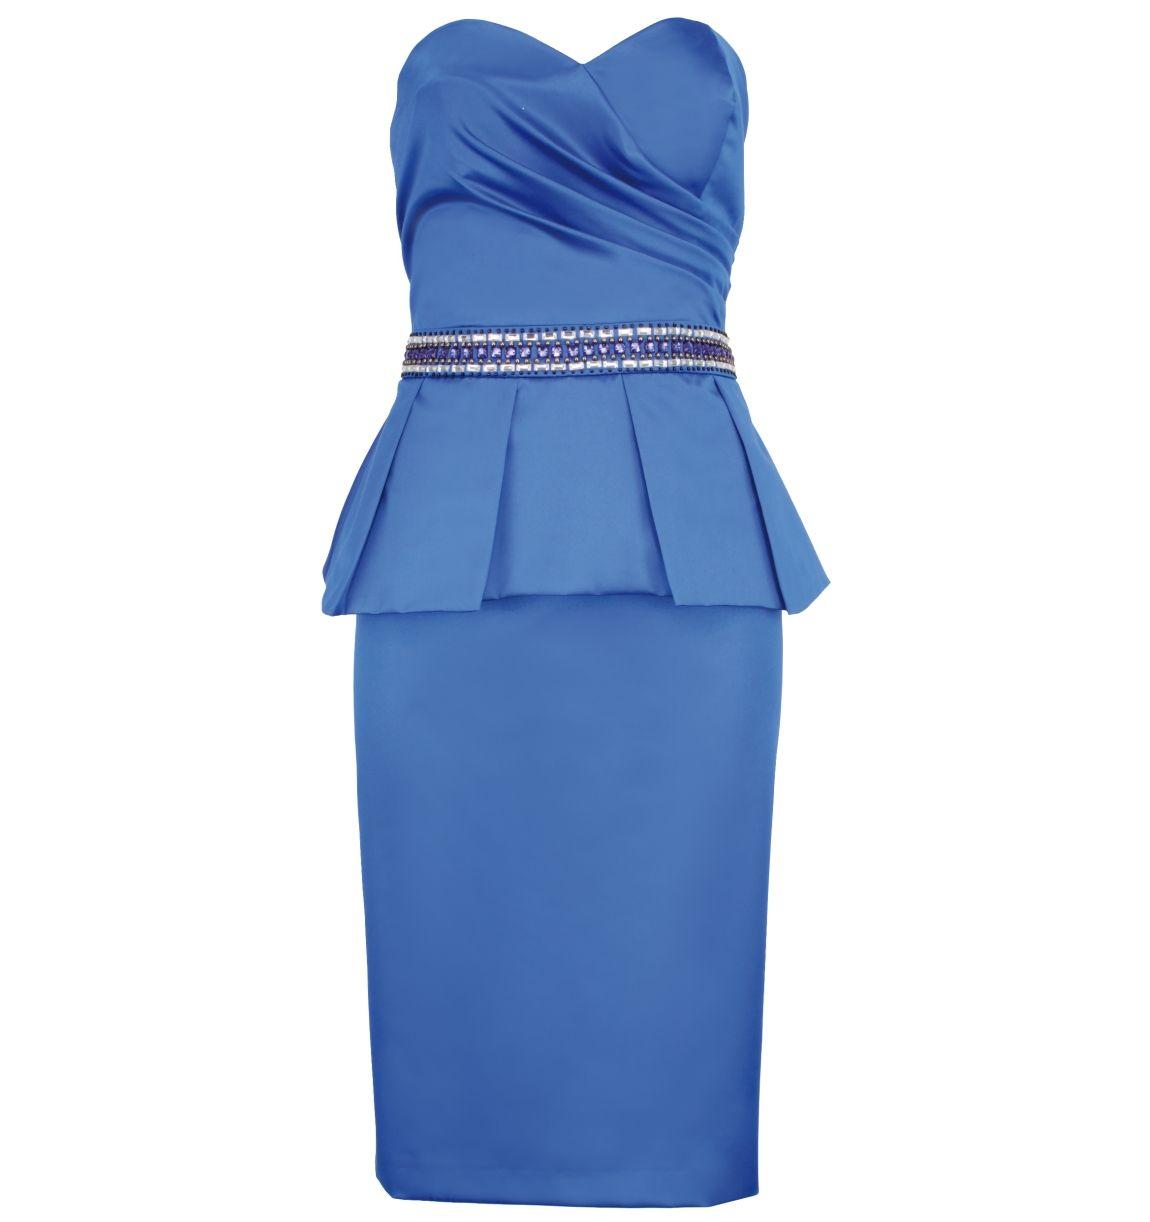 Peplum Dress at Foschini R540   All things fashion   Pinterest ...